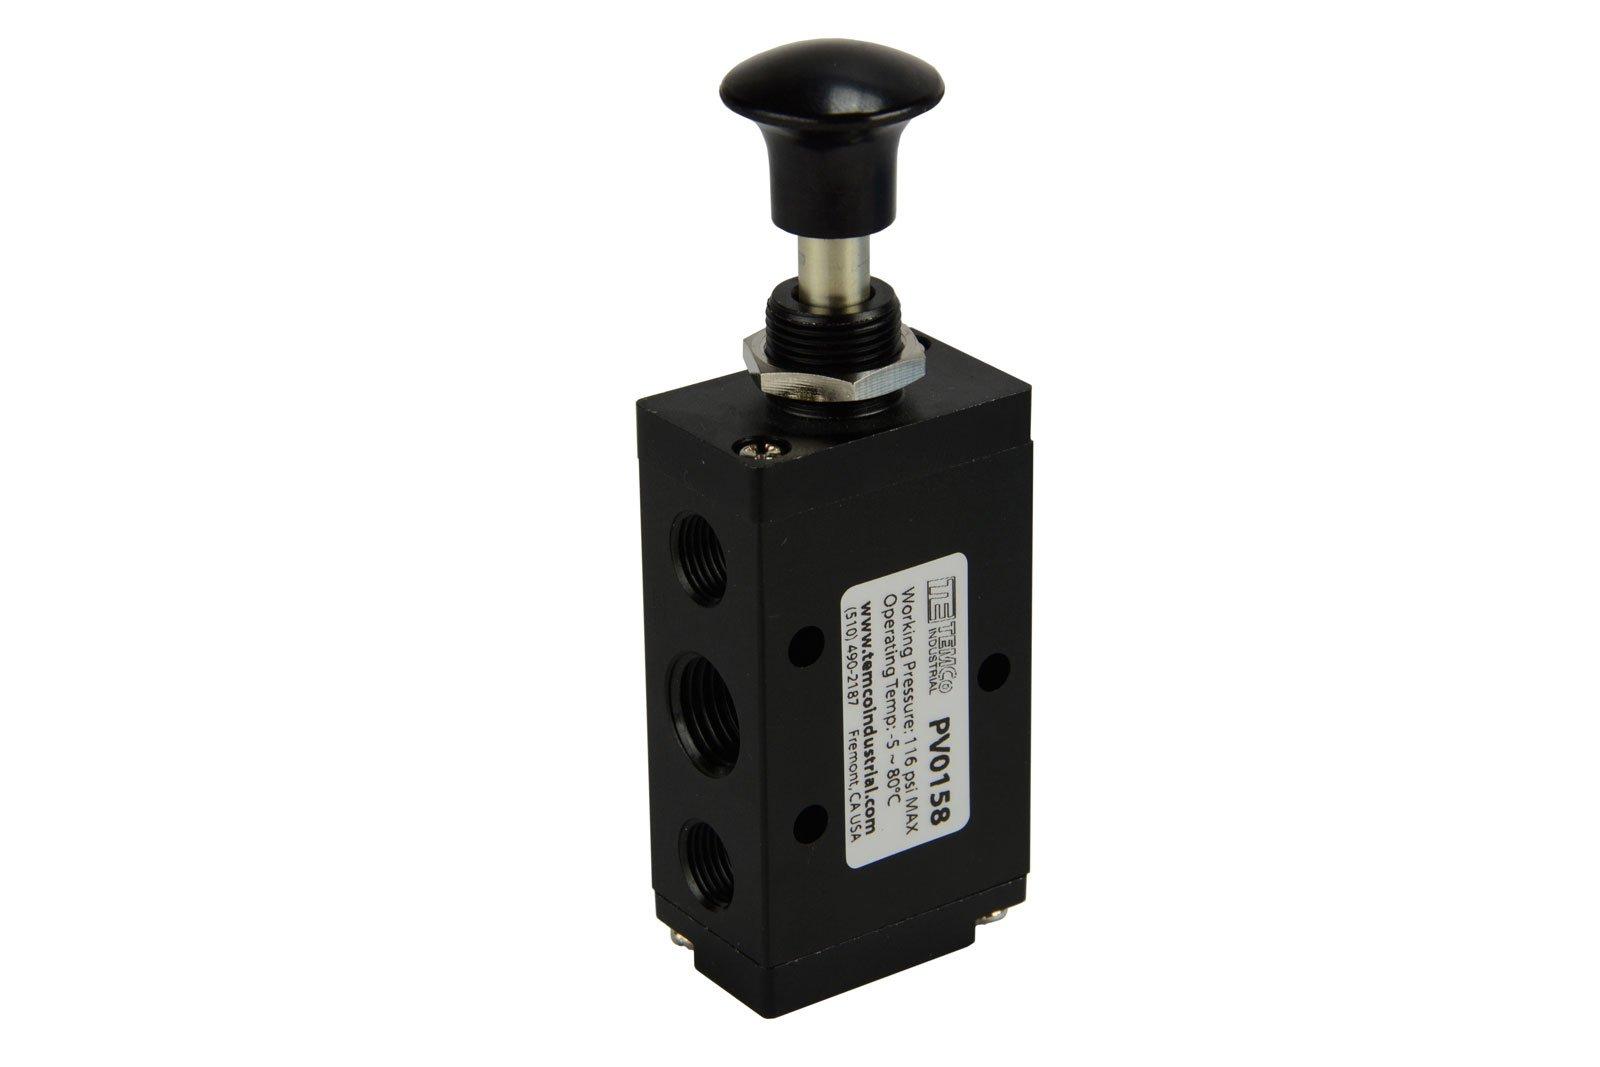 Hand Push Pull Button Pneumatic Air Control Valve 5 Port 4 Way 2 Position 1/4'' NPT